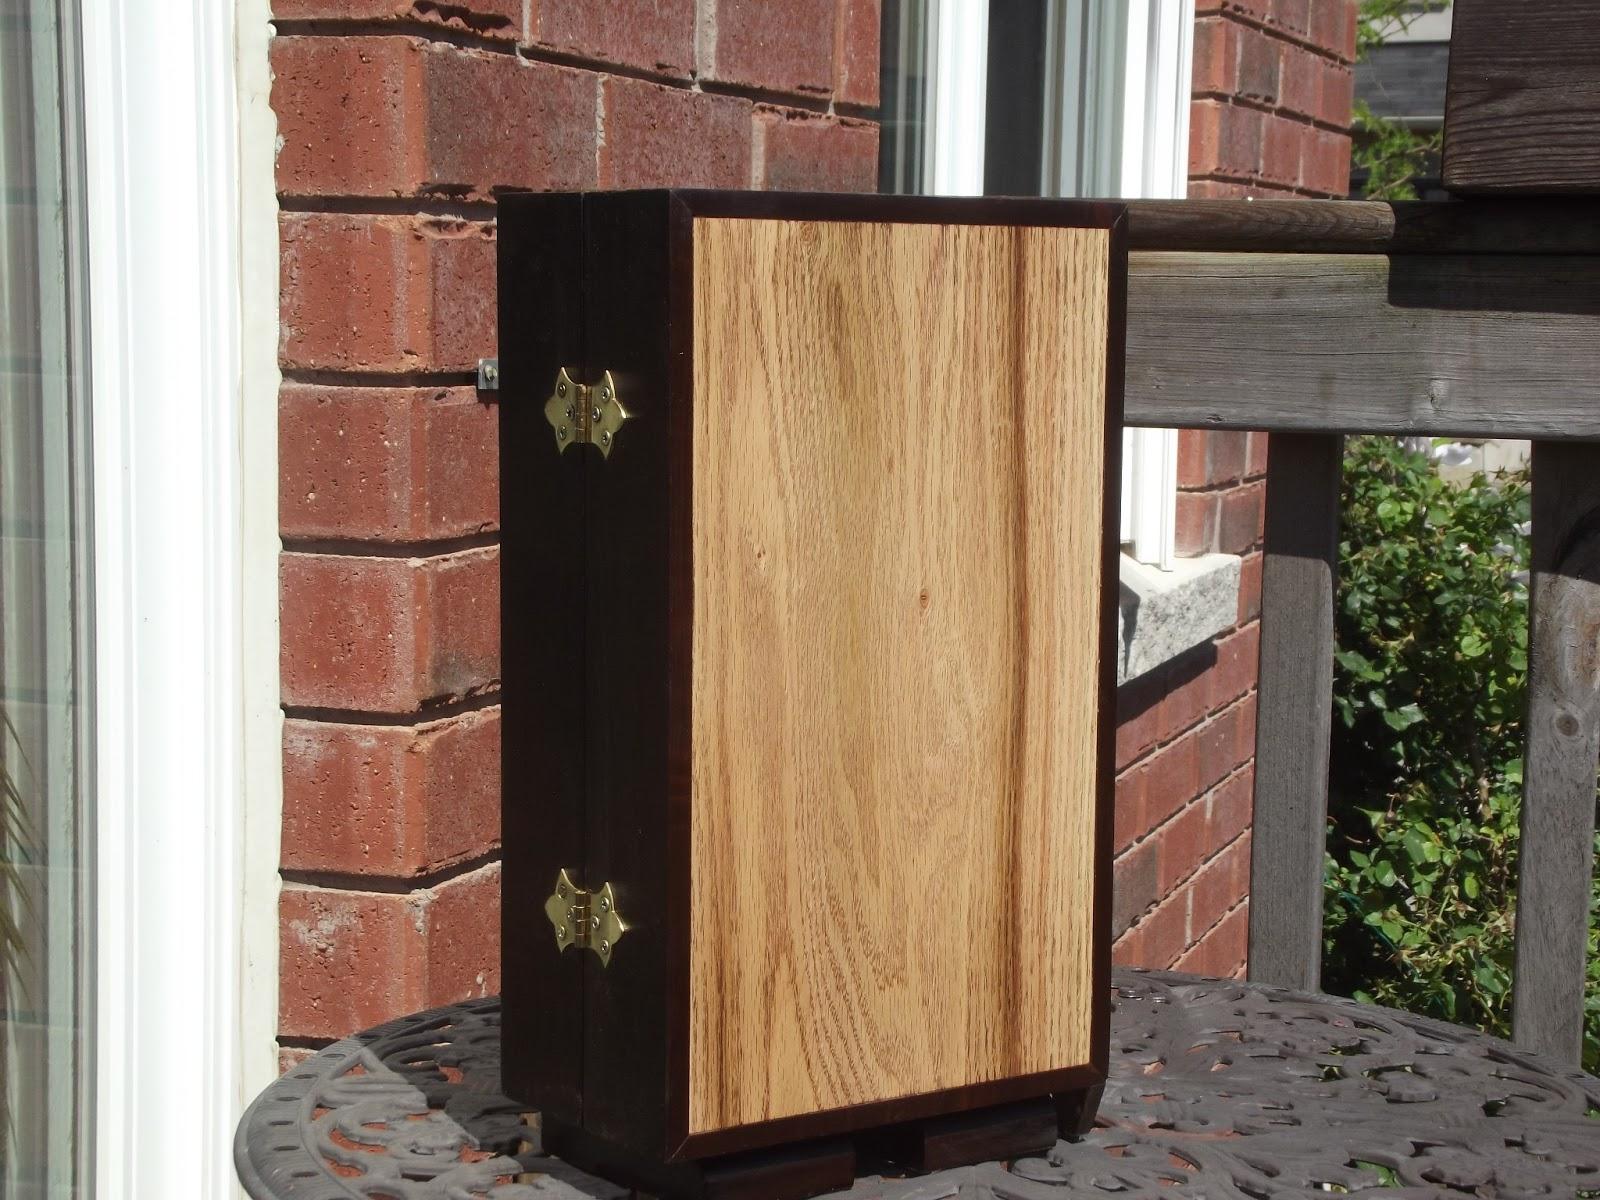 A jewelry box